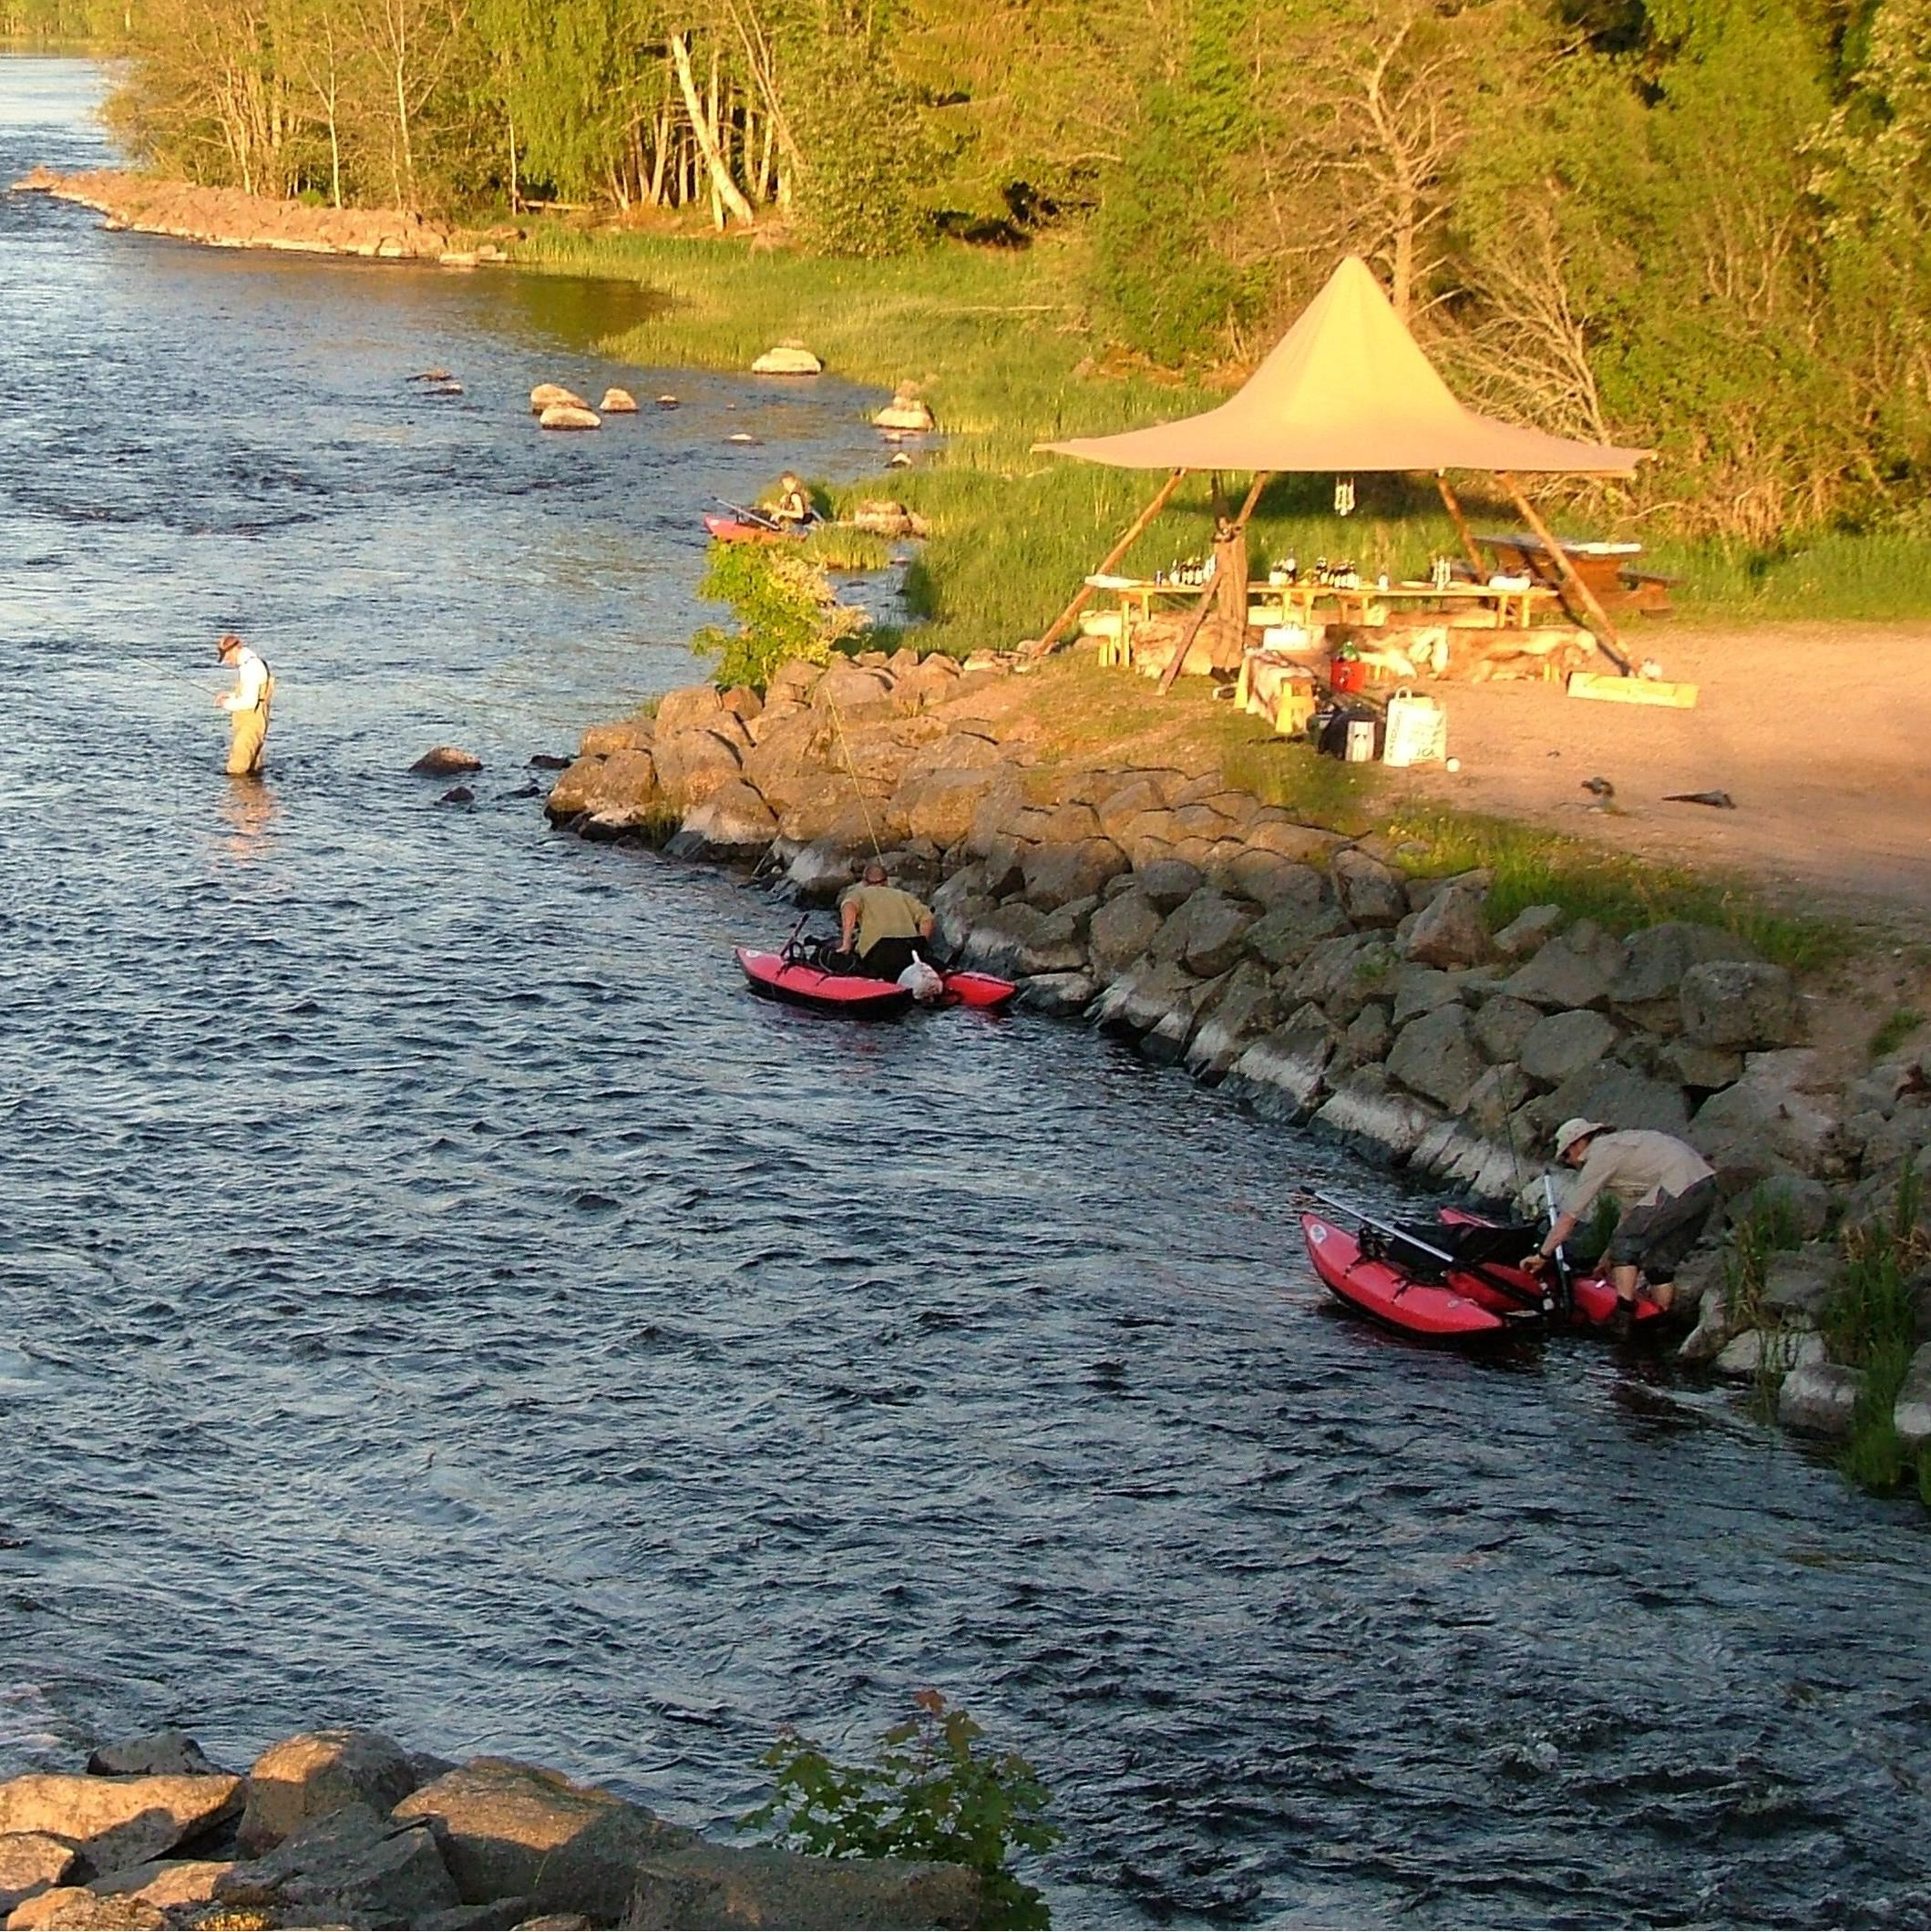 Rental of canoes  - Gysinge - Äventyrsservice